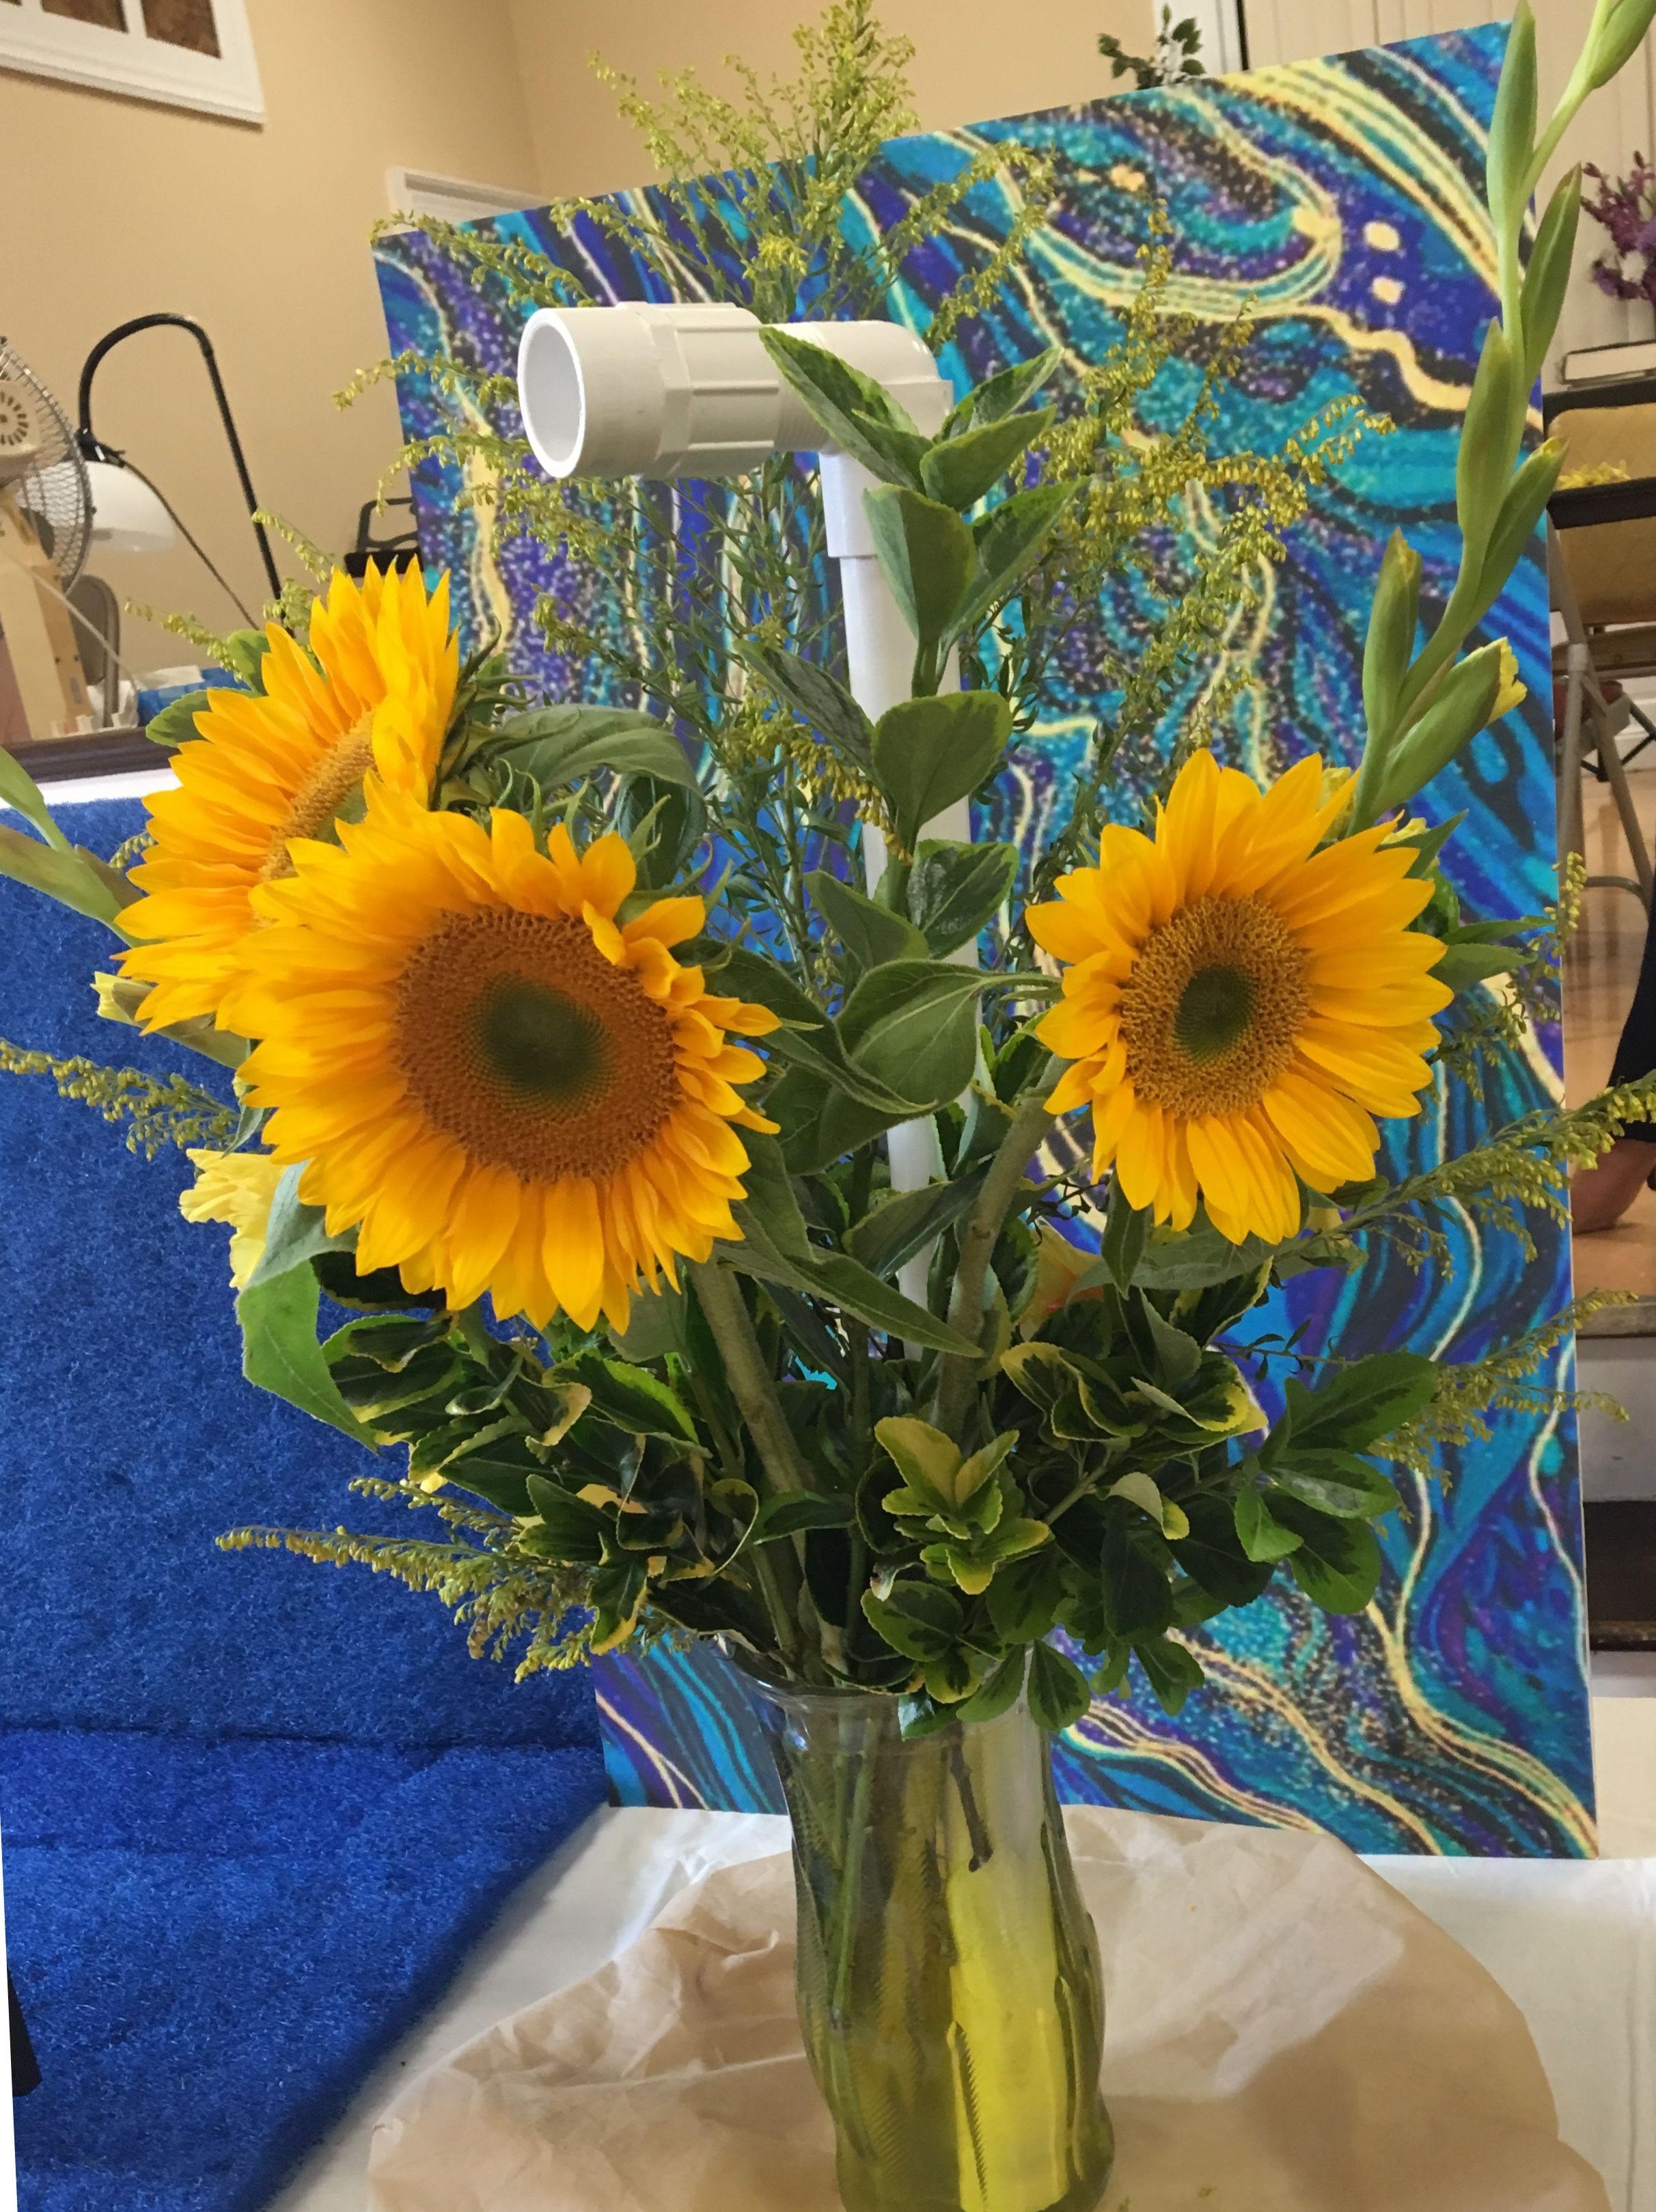 Flower Arrangement For Garden Show With Yellow Submarine Theme